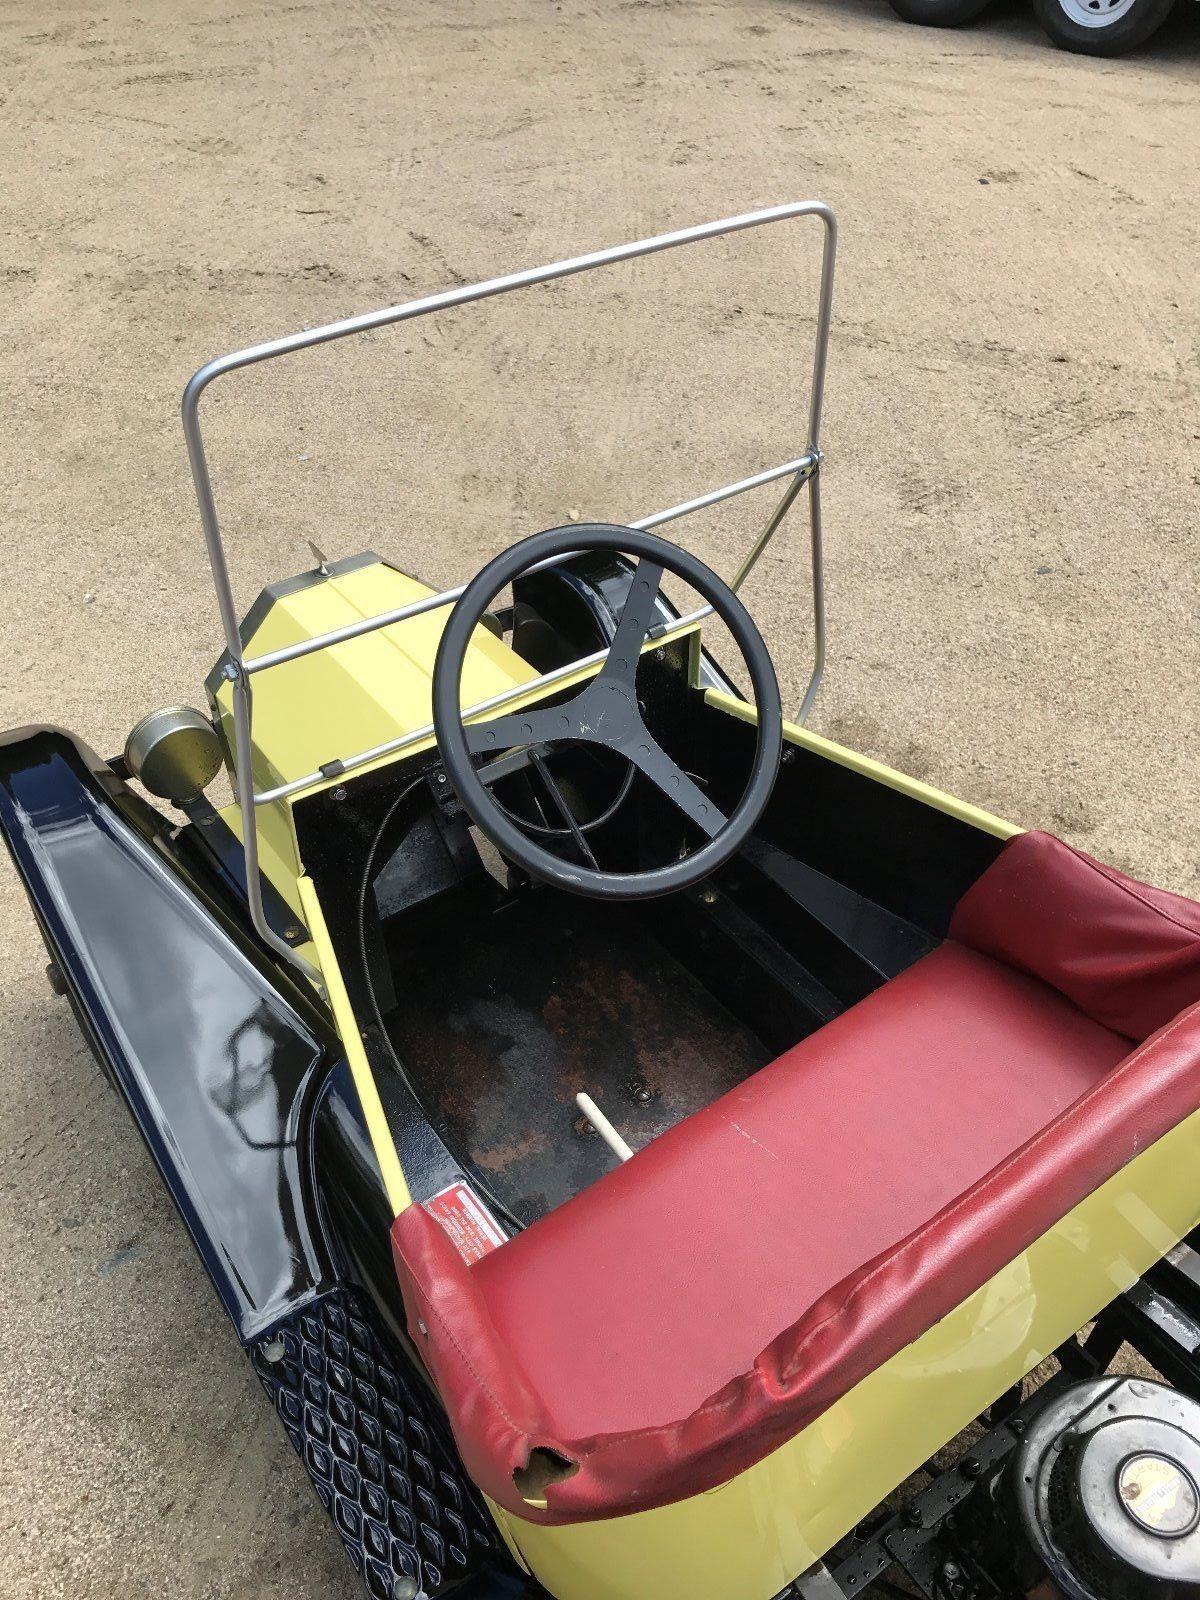 Shriners parade car tin lizzie model t go kart